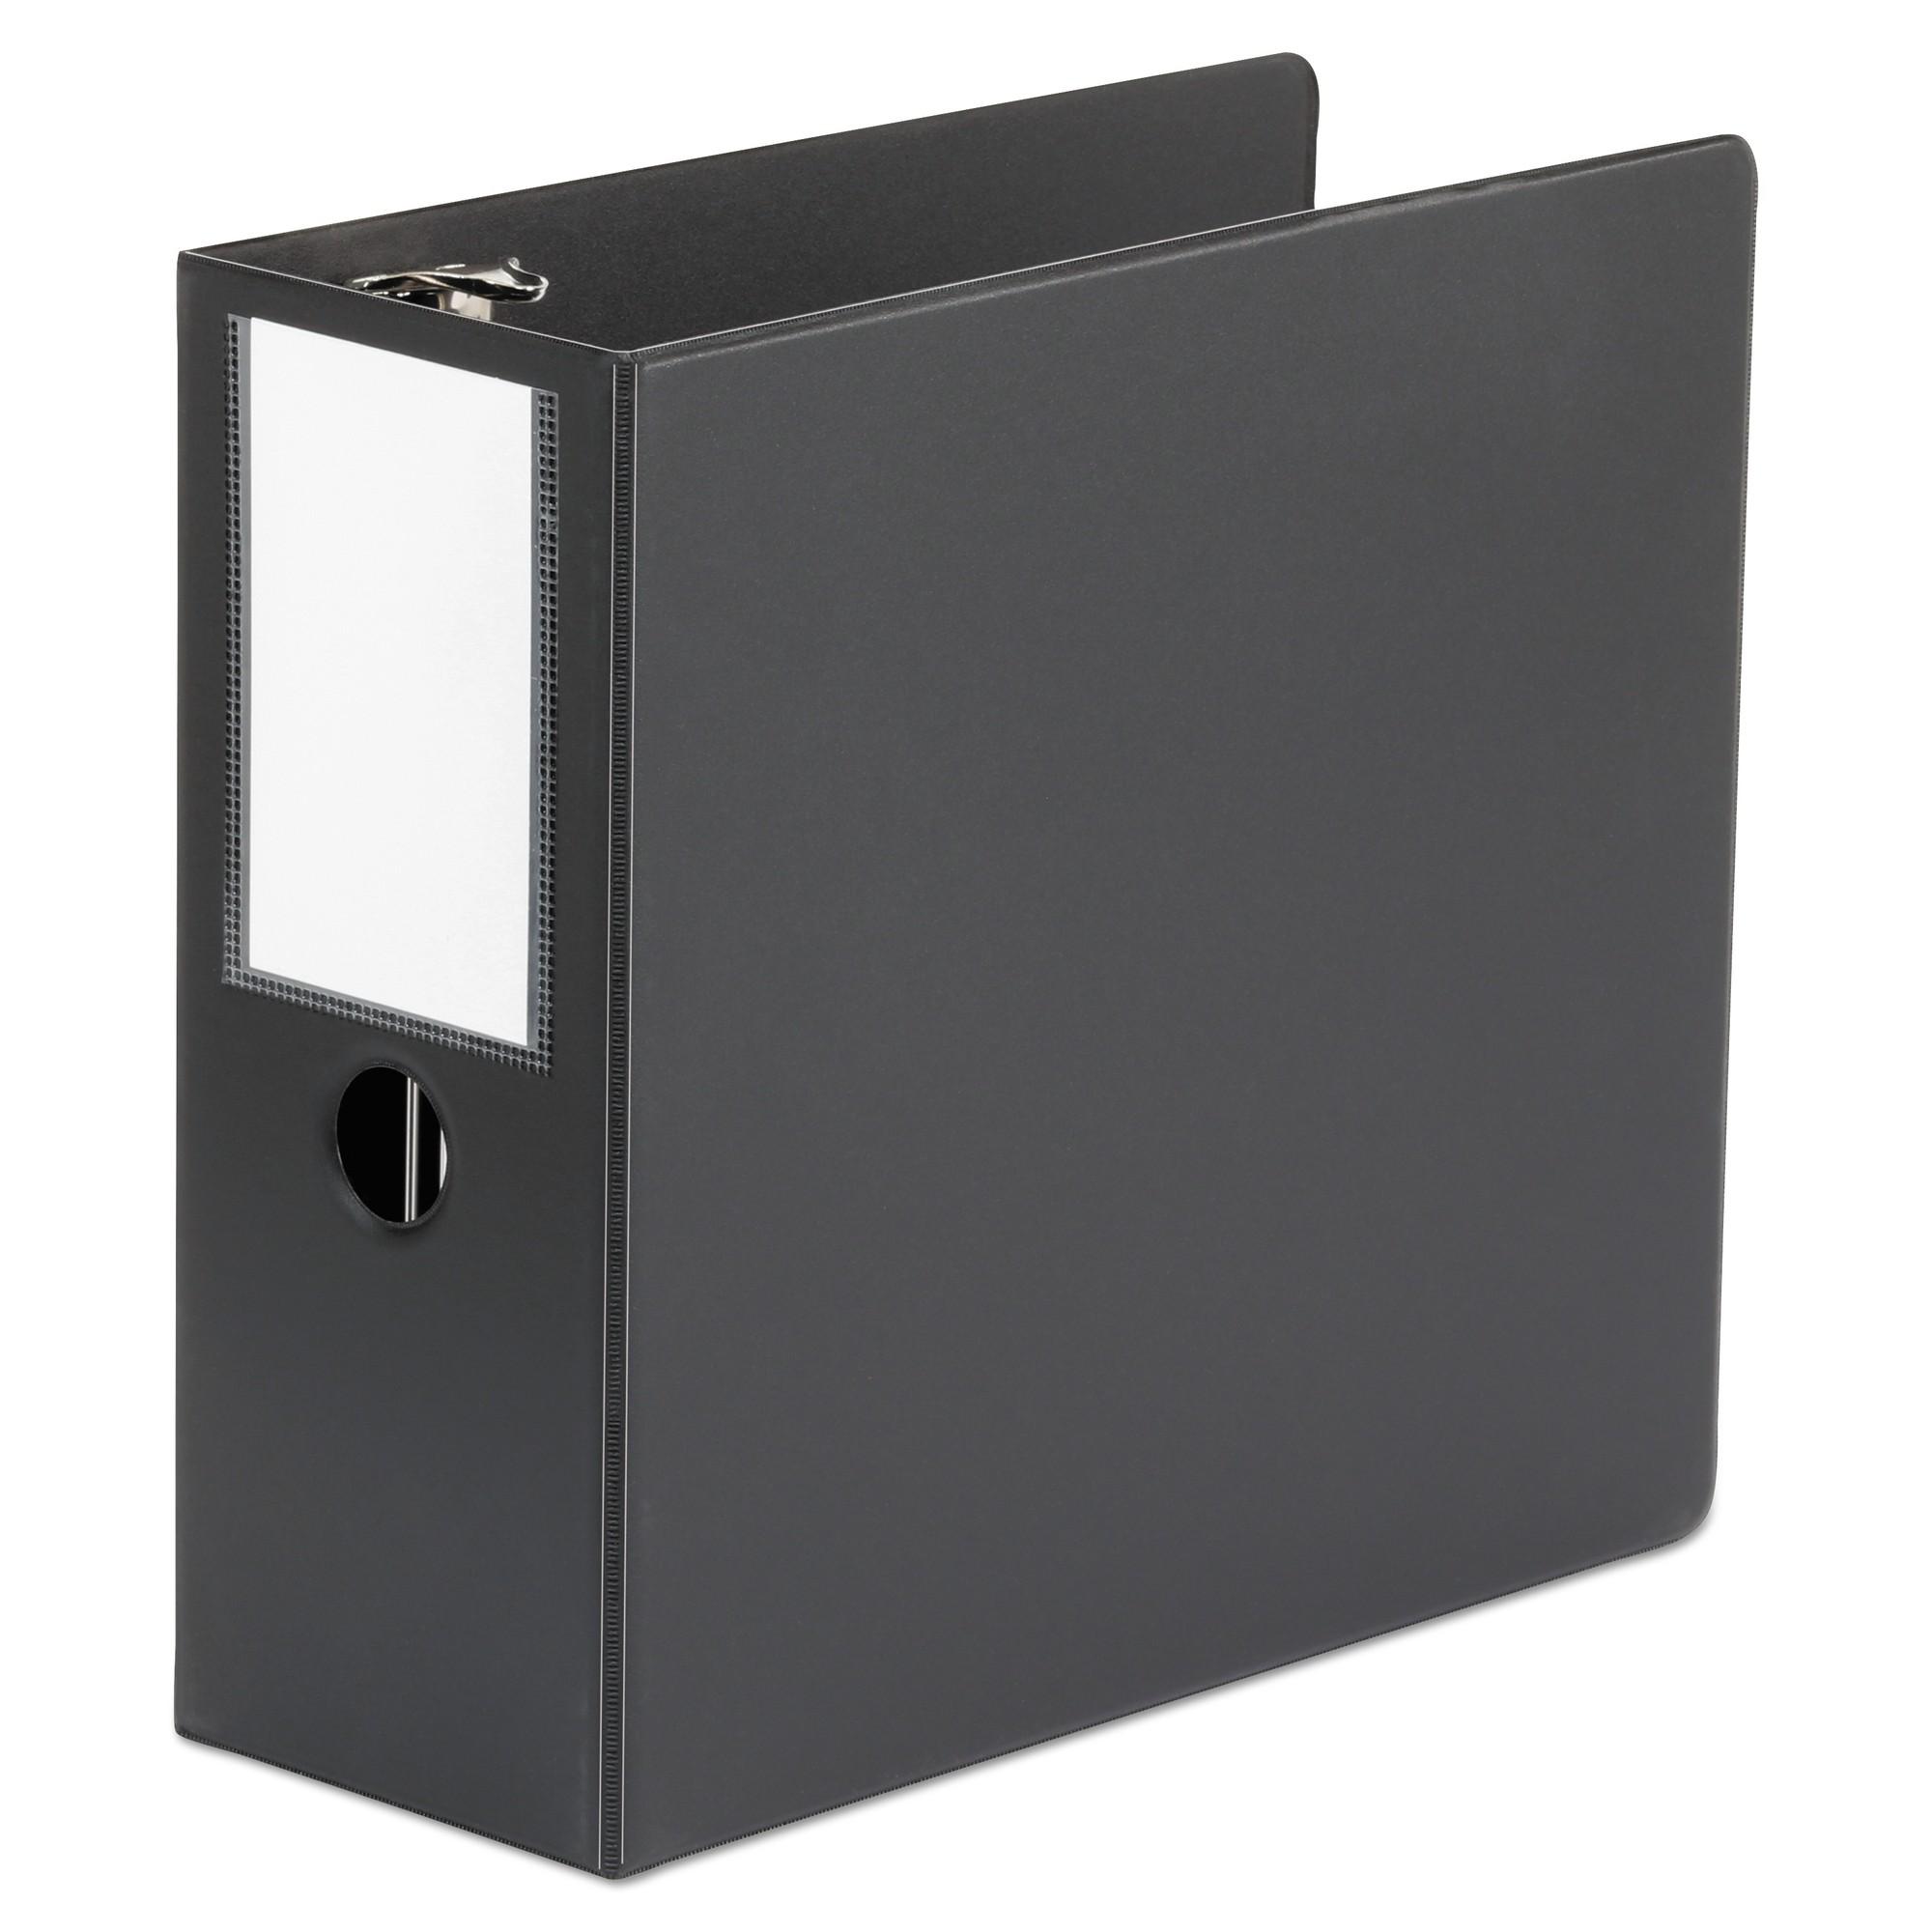 "D-Ring Binder, 5"" Capacity, 8-1/2 x 11, Black"